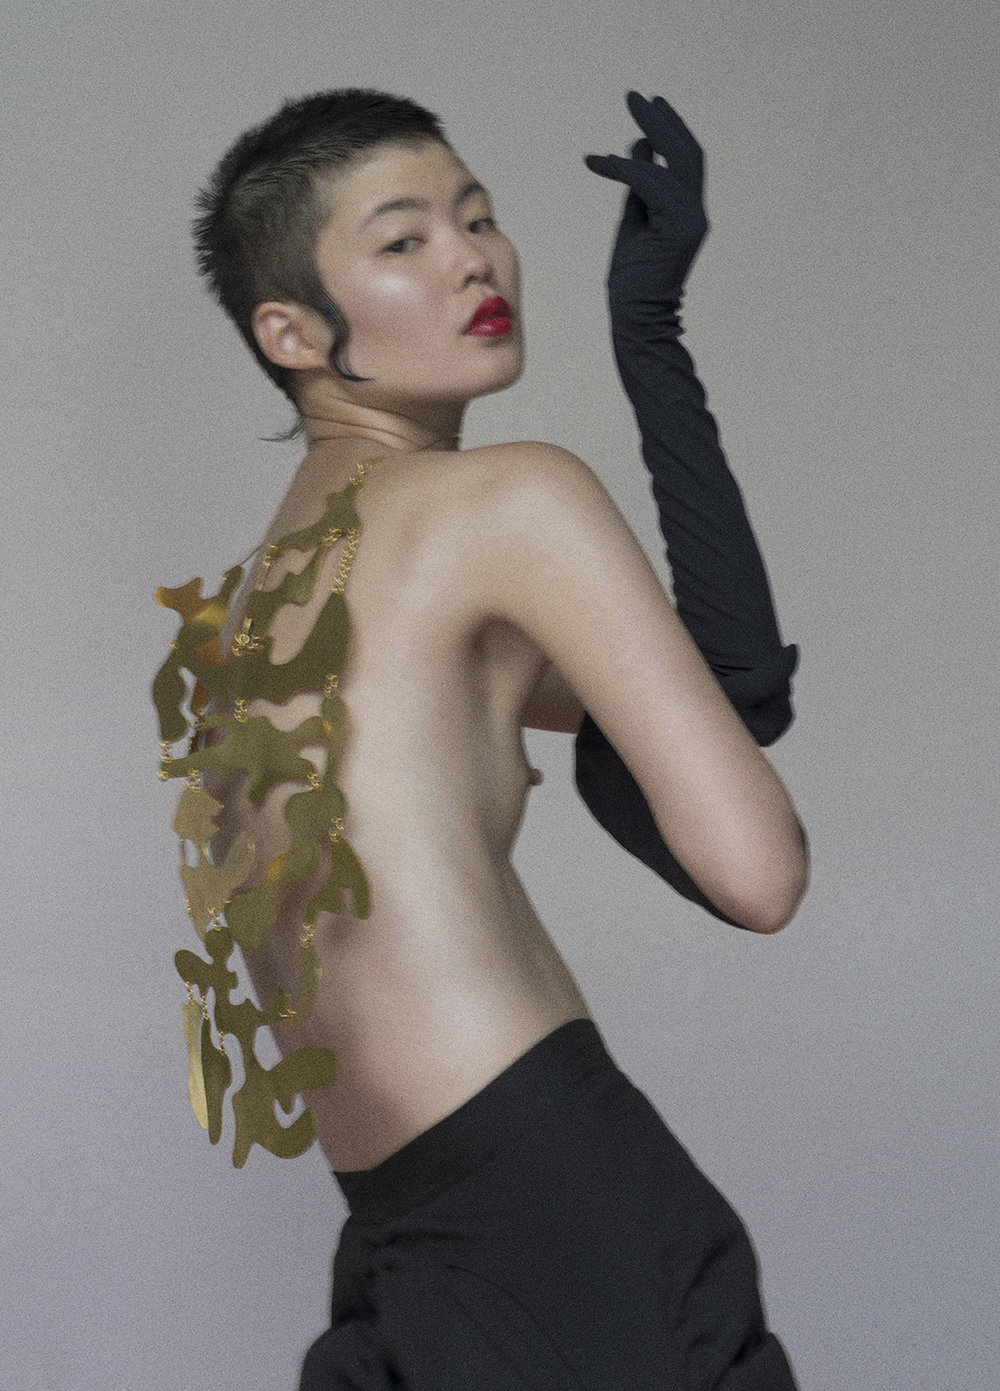 On The Rock - Demi Demu / Manami Kinoshita